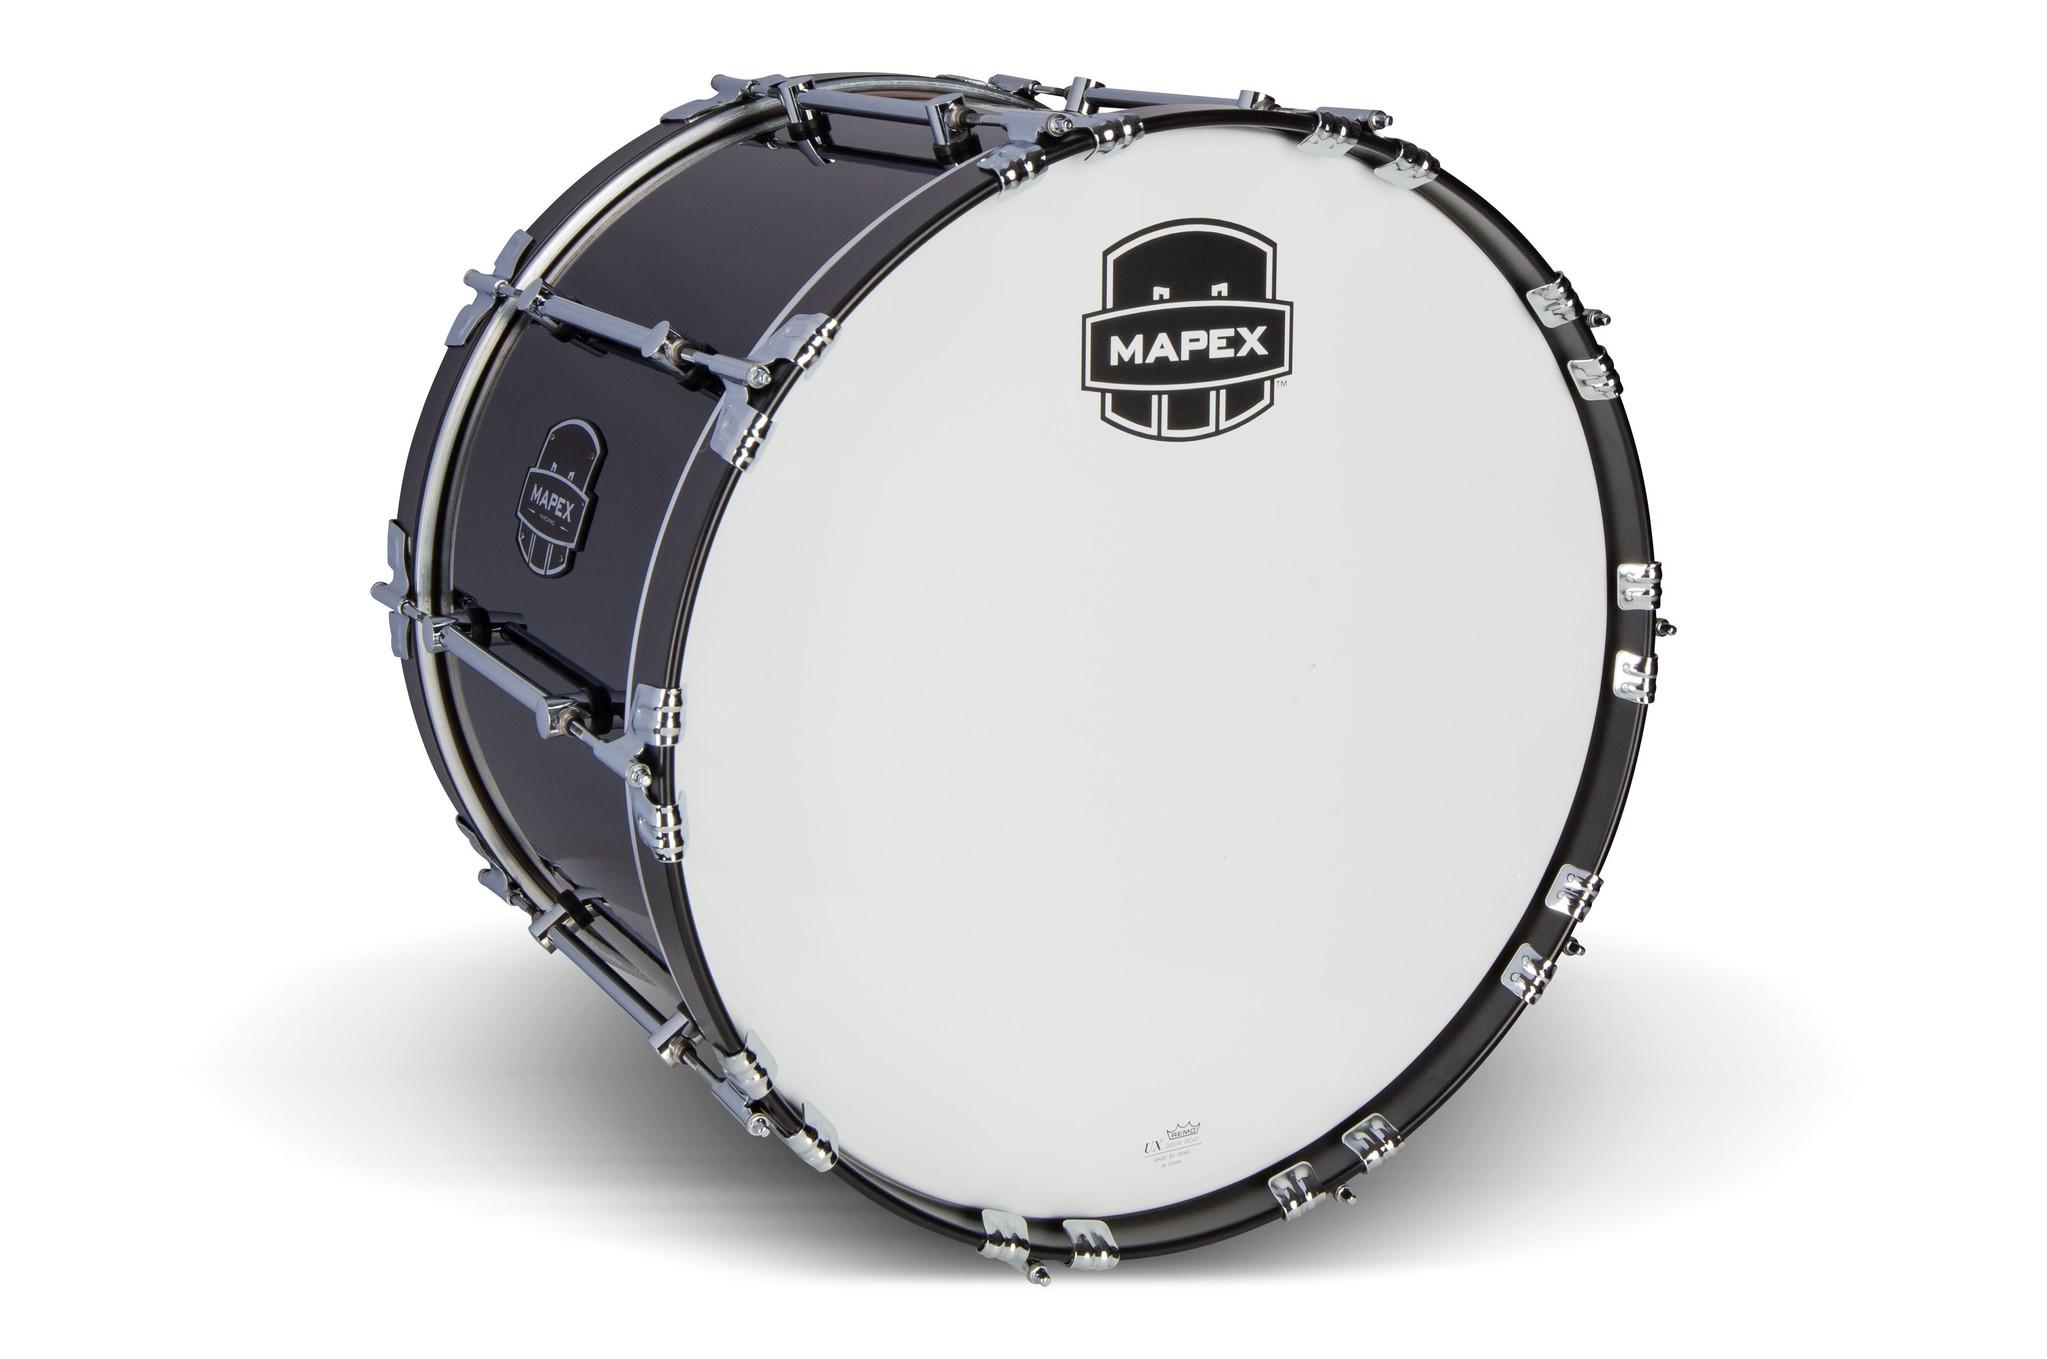 Mapex 22 Inch Quantum Mark II Bass Drum